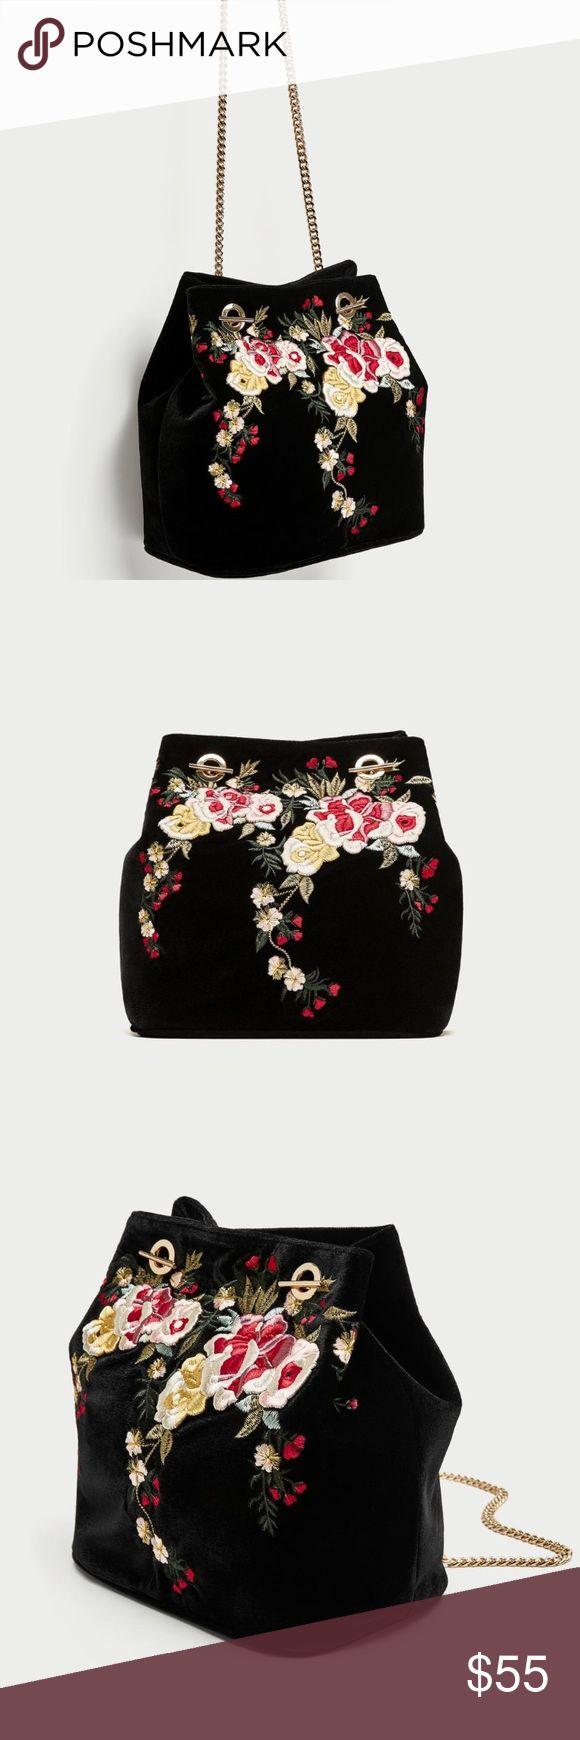 Embroidered Velvet Bucket Bag Black velvet bucket bag with floral embroidery on the front. Zara Bags Shoulder Bags